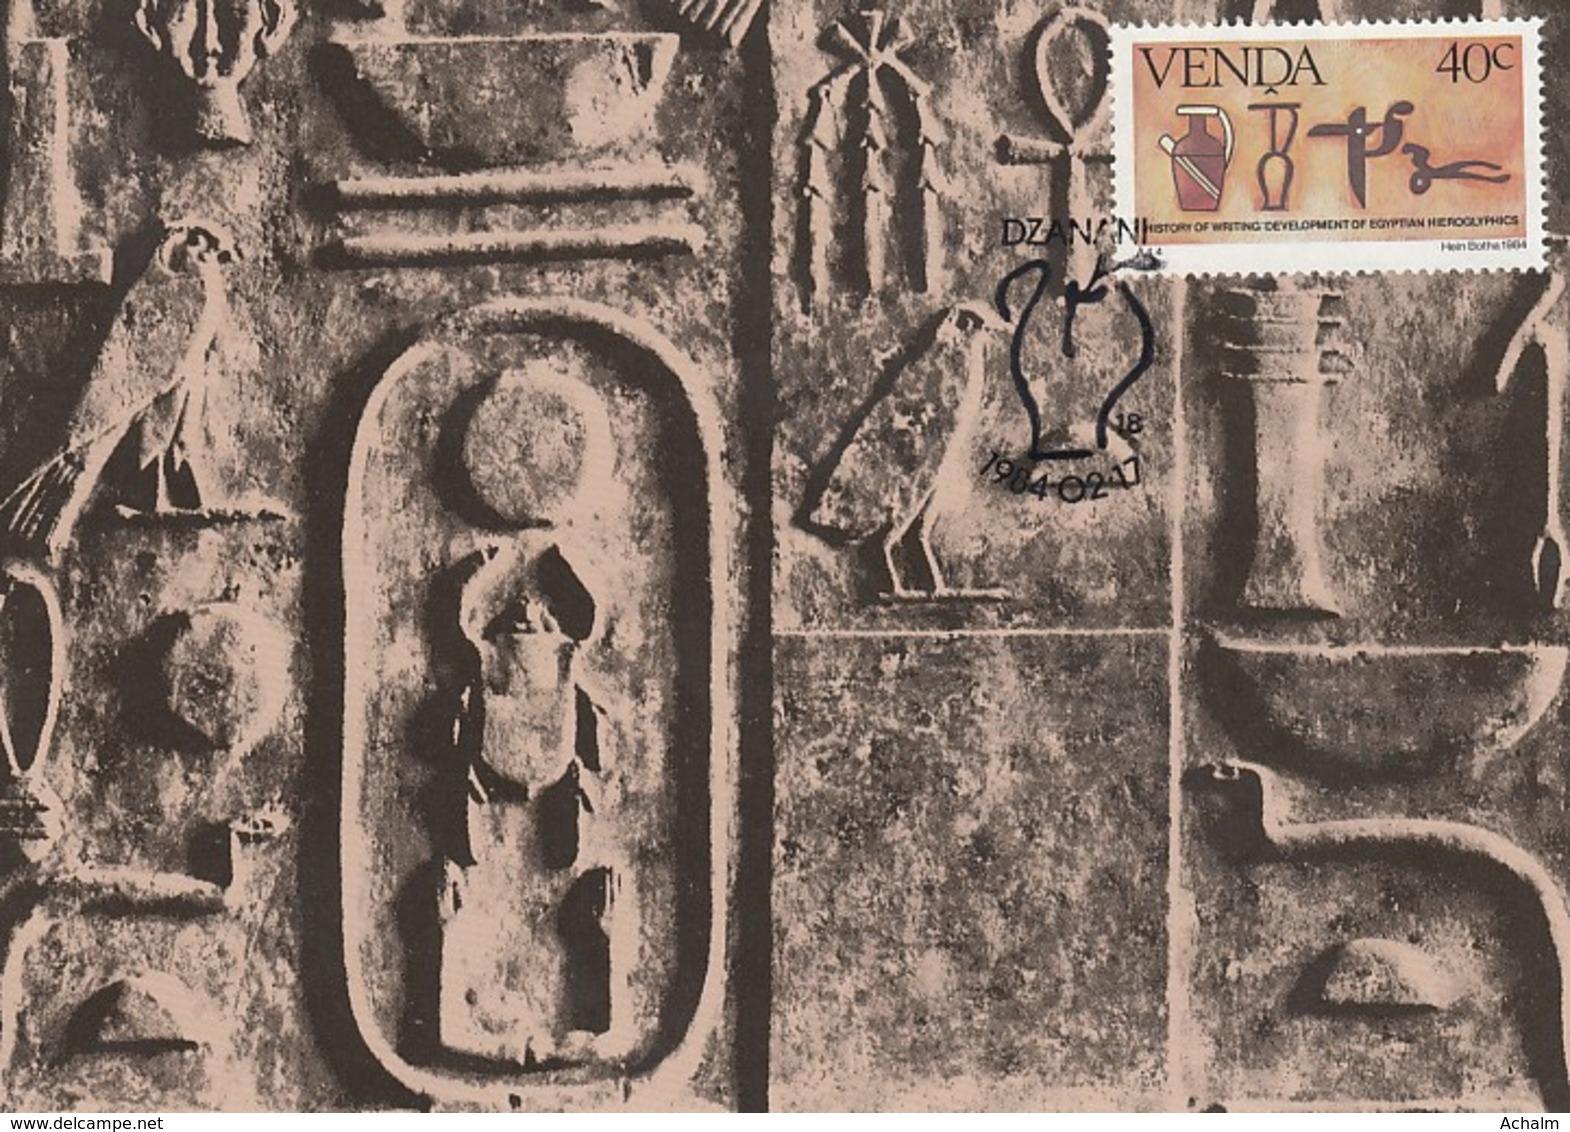 Venda - Maximum Card Of 1984 - MiNr. 89 - History Of The Writing - Egyptian Hieroglyphs - Venda